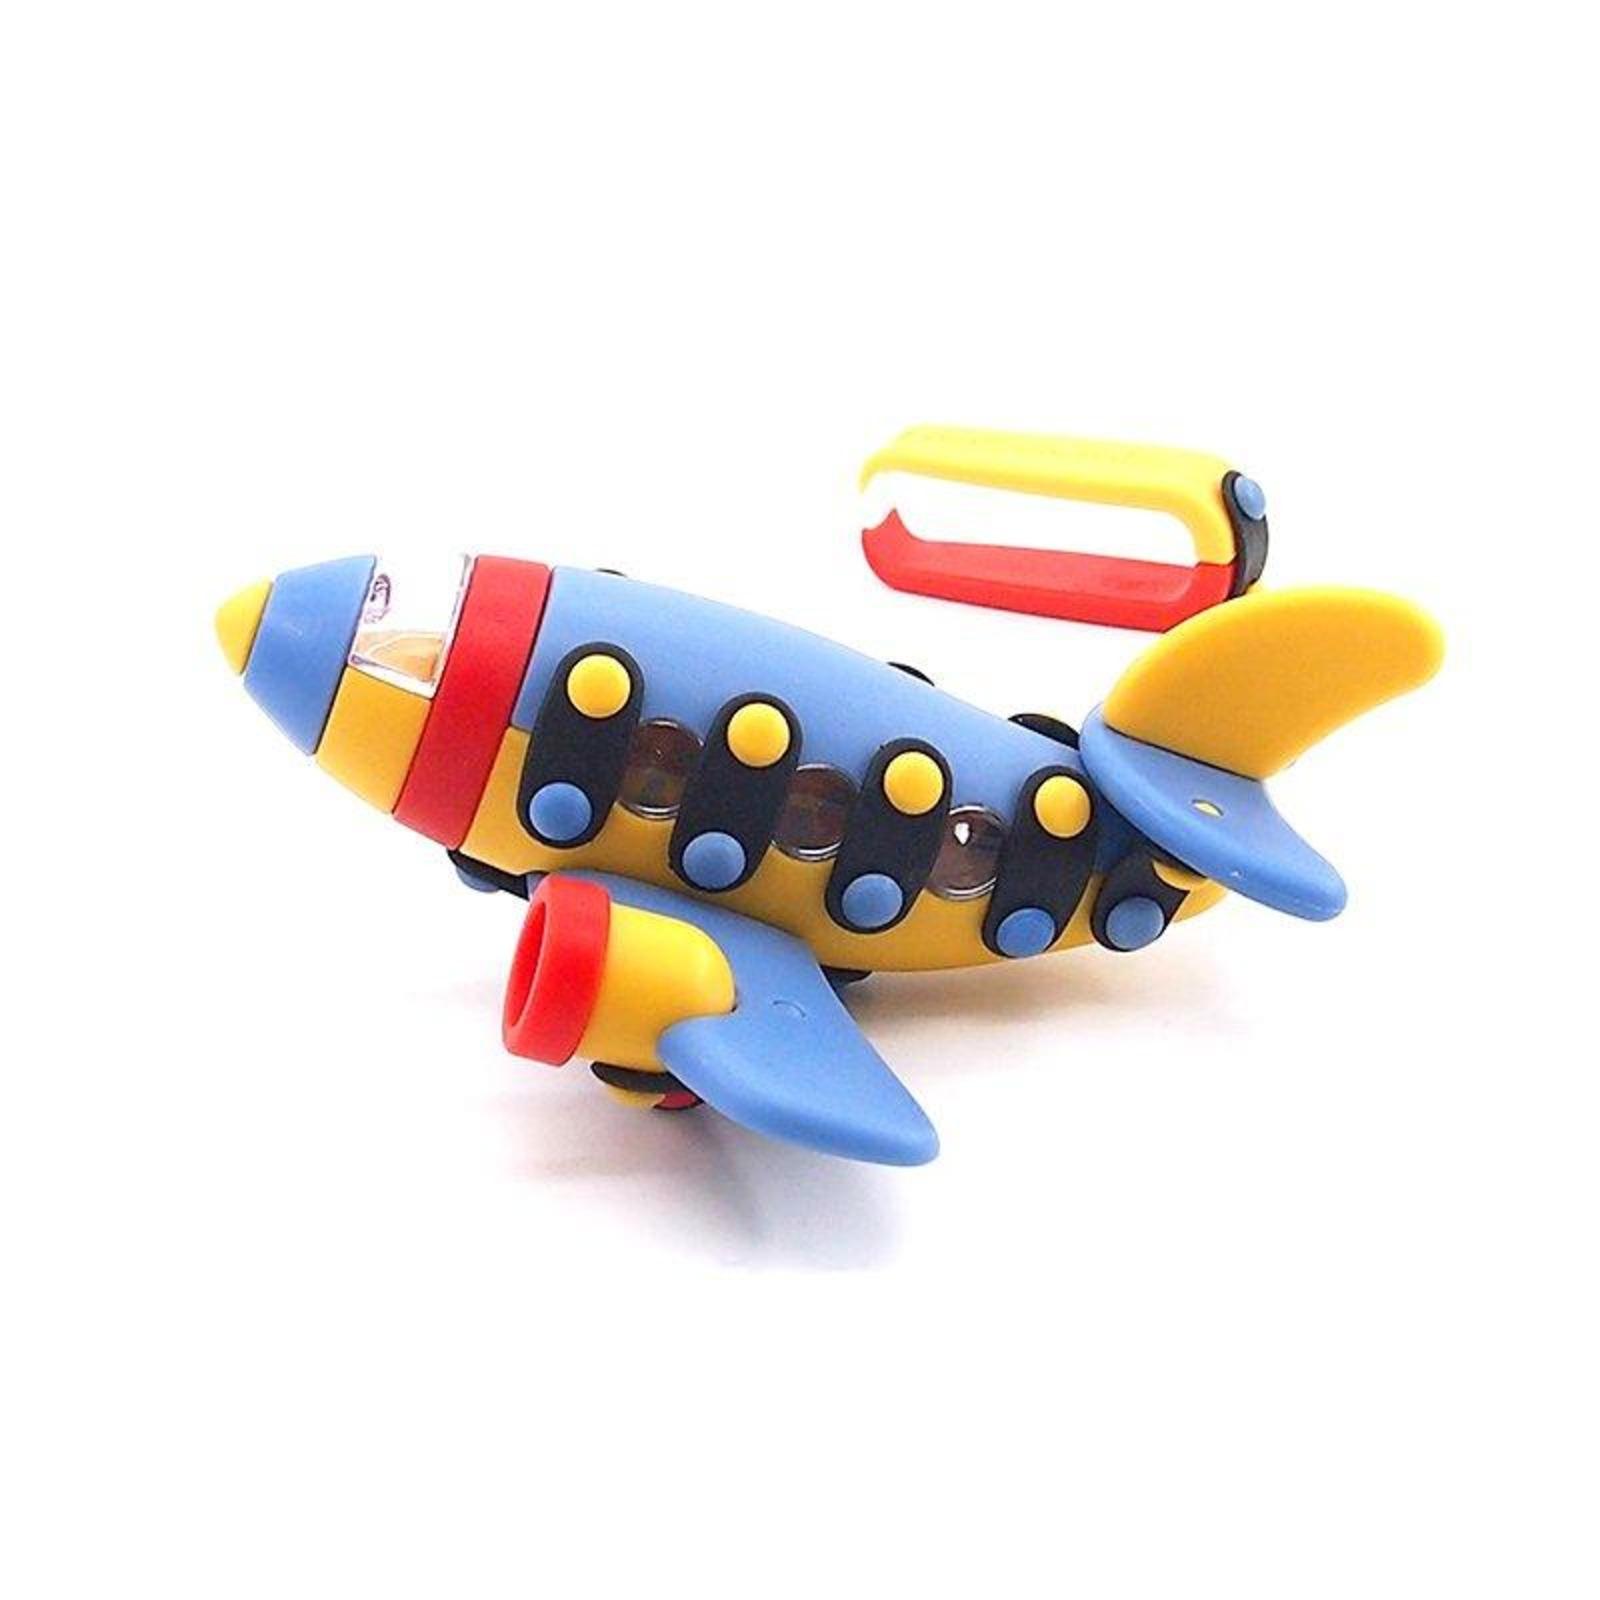 Mic-O-Mic Mic-O-Mic Small Jet Plane (089.106)